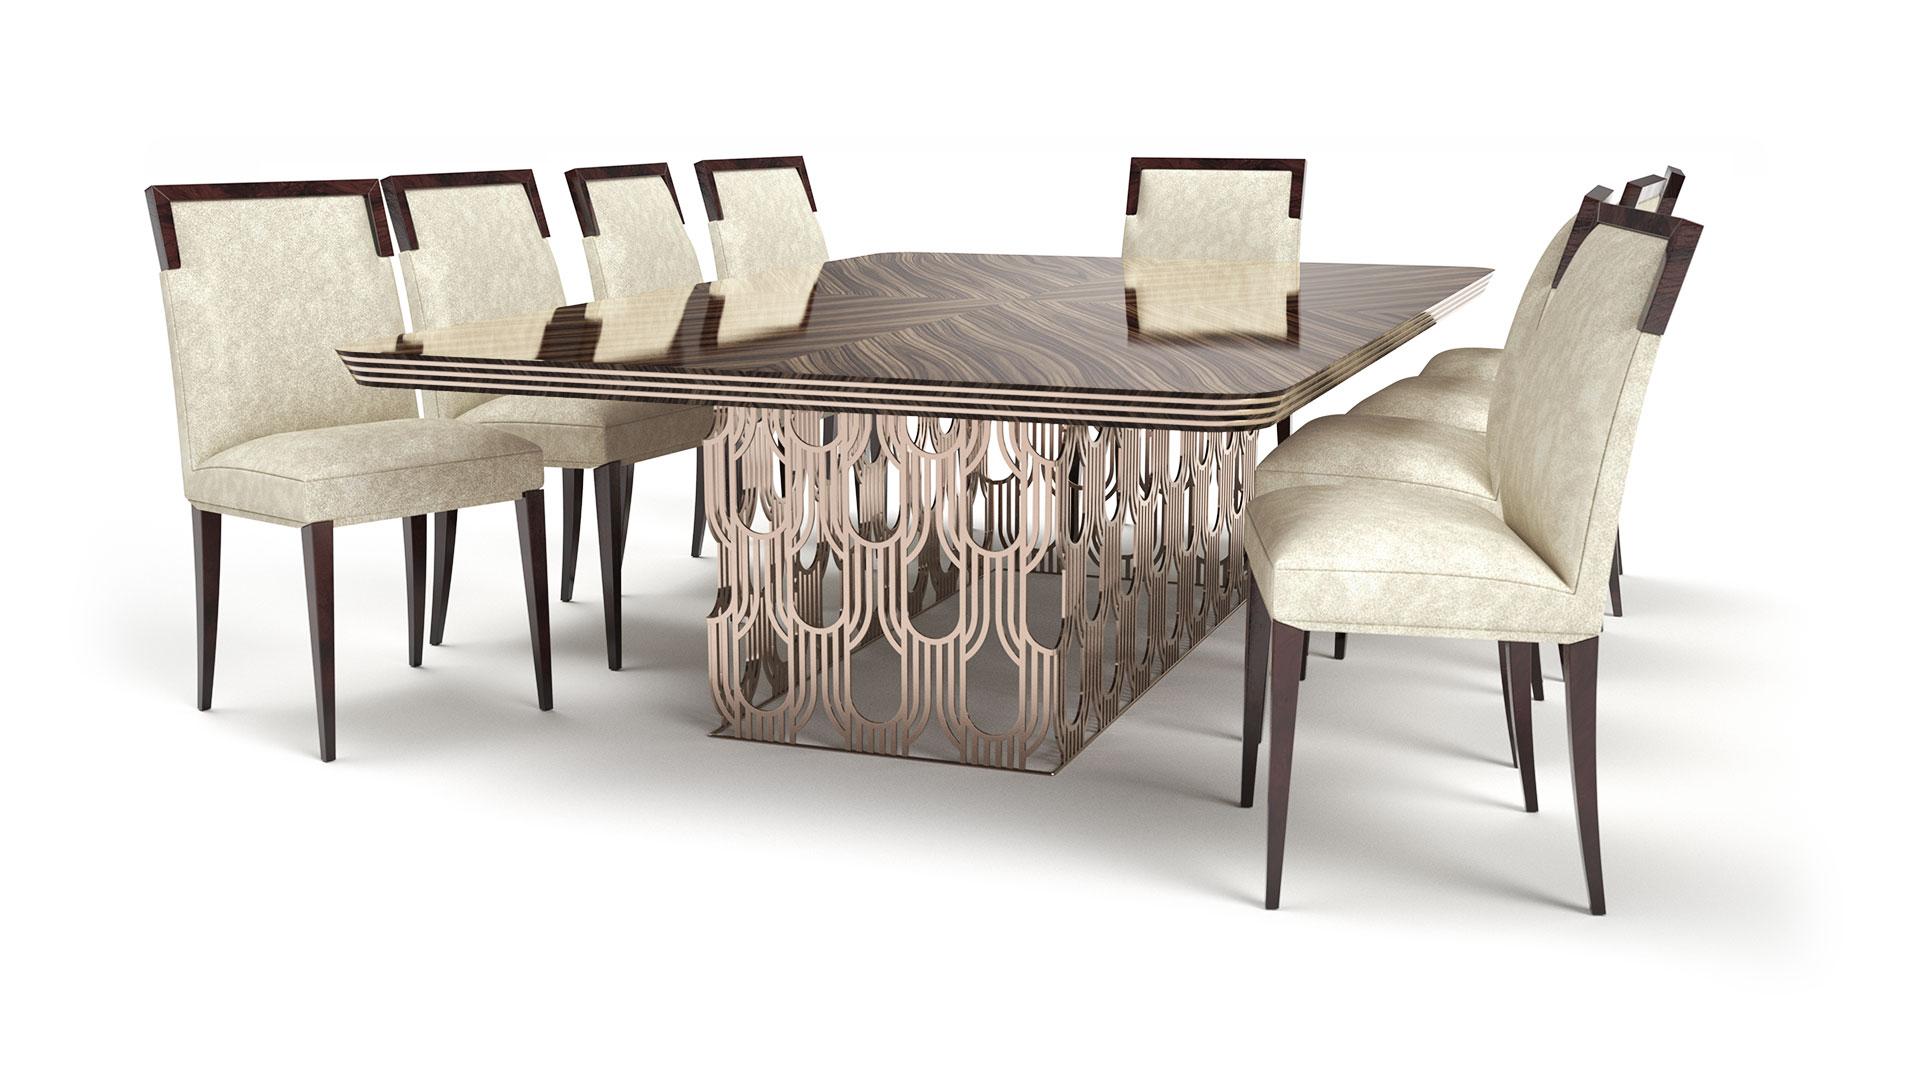 Stol Art Deco Straight Husk krzesla